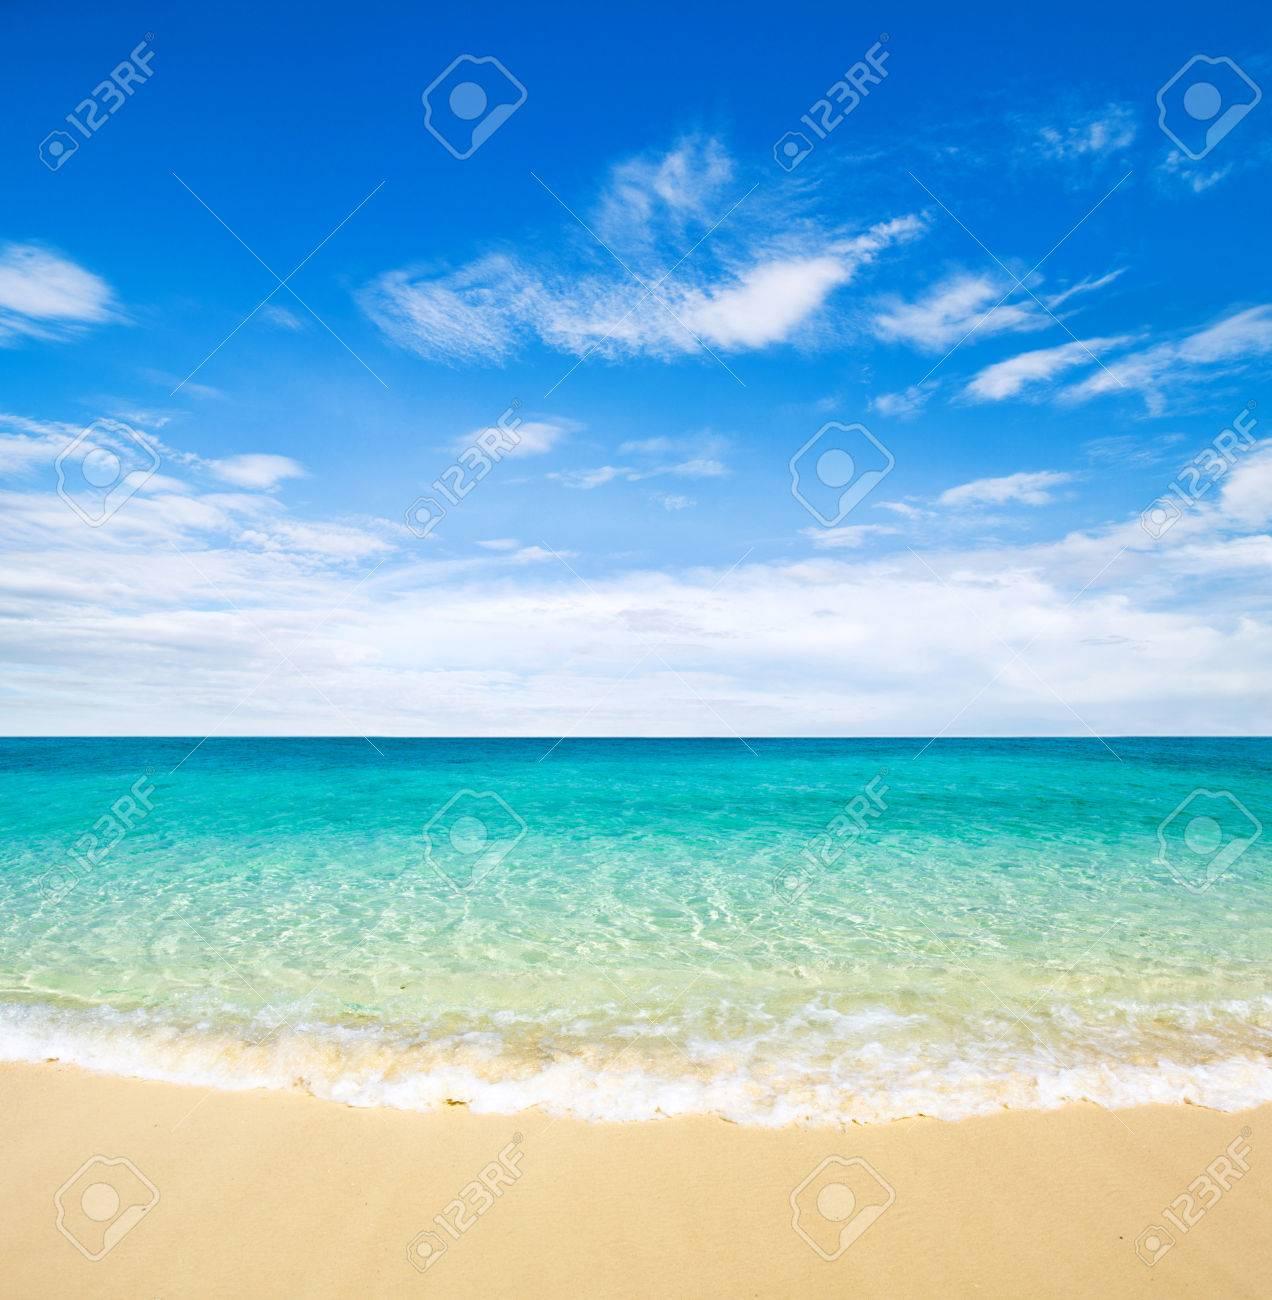 beautiful beach and tropical sea Stock Photo - 43716922